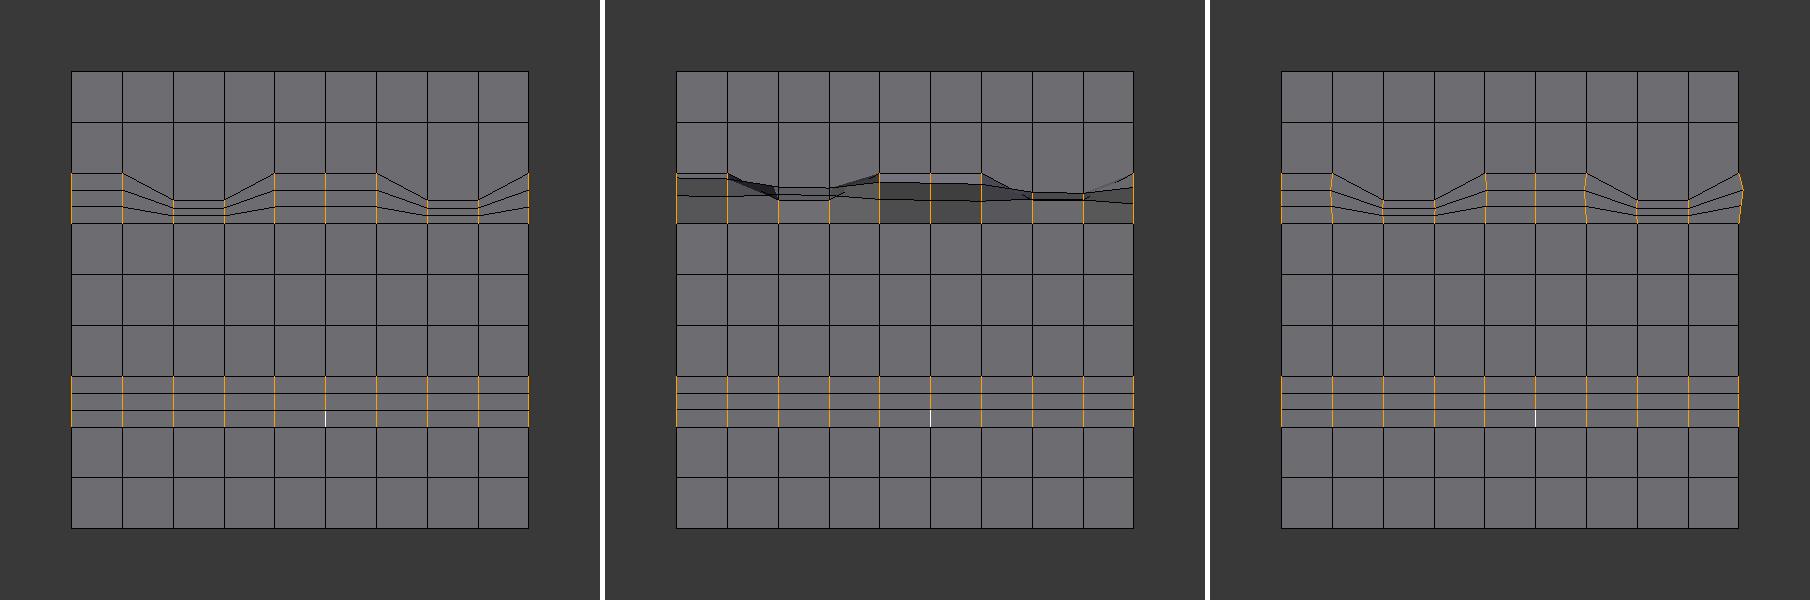 subdivide-edge-ring-interpolation